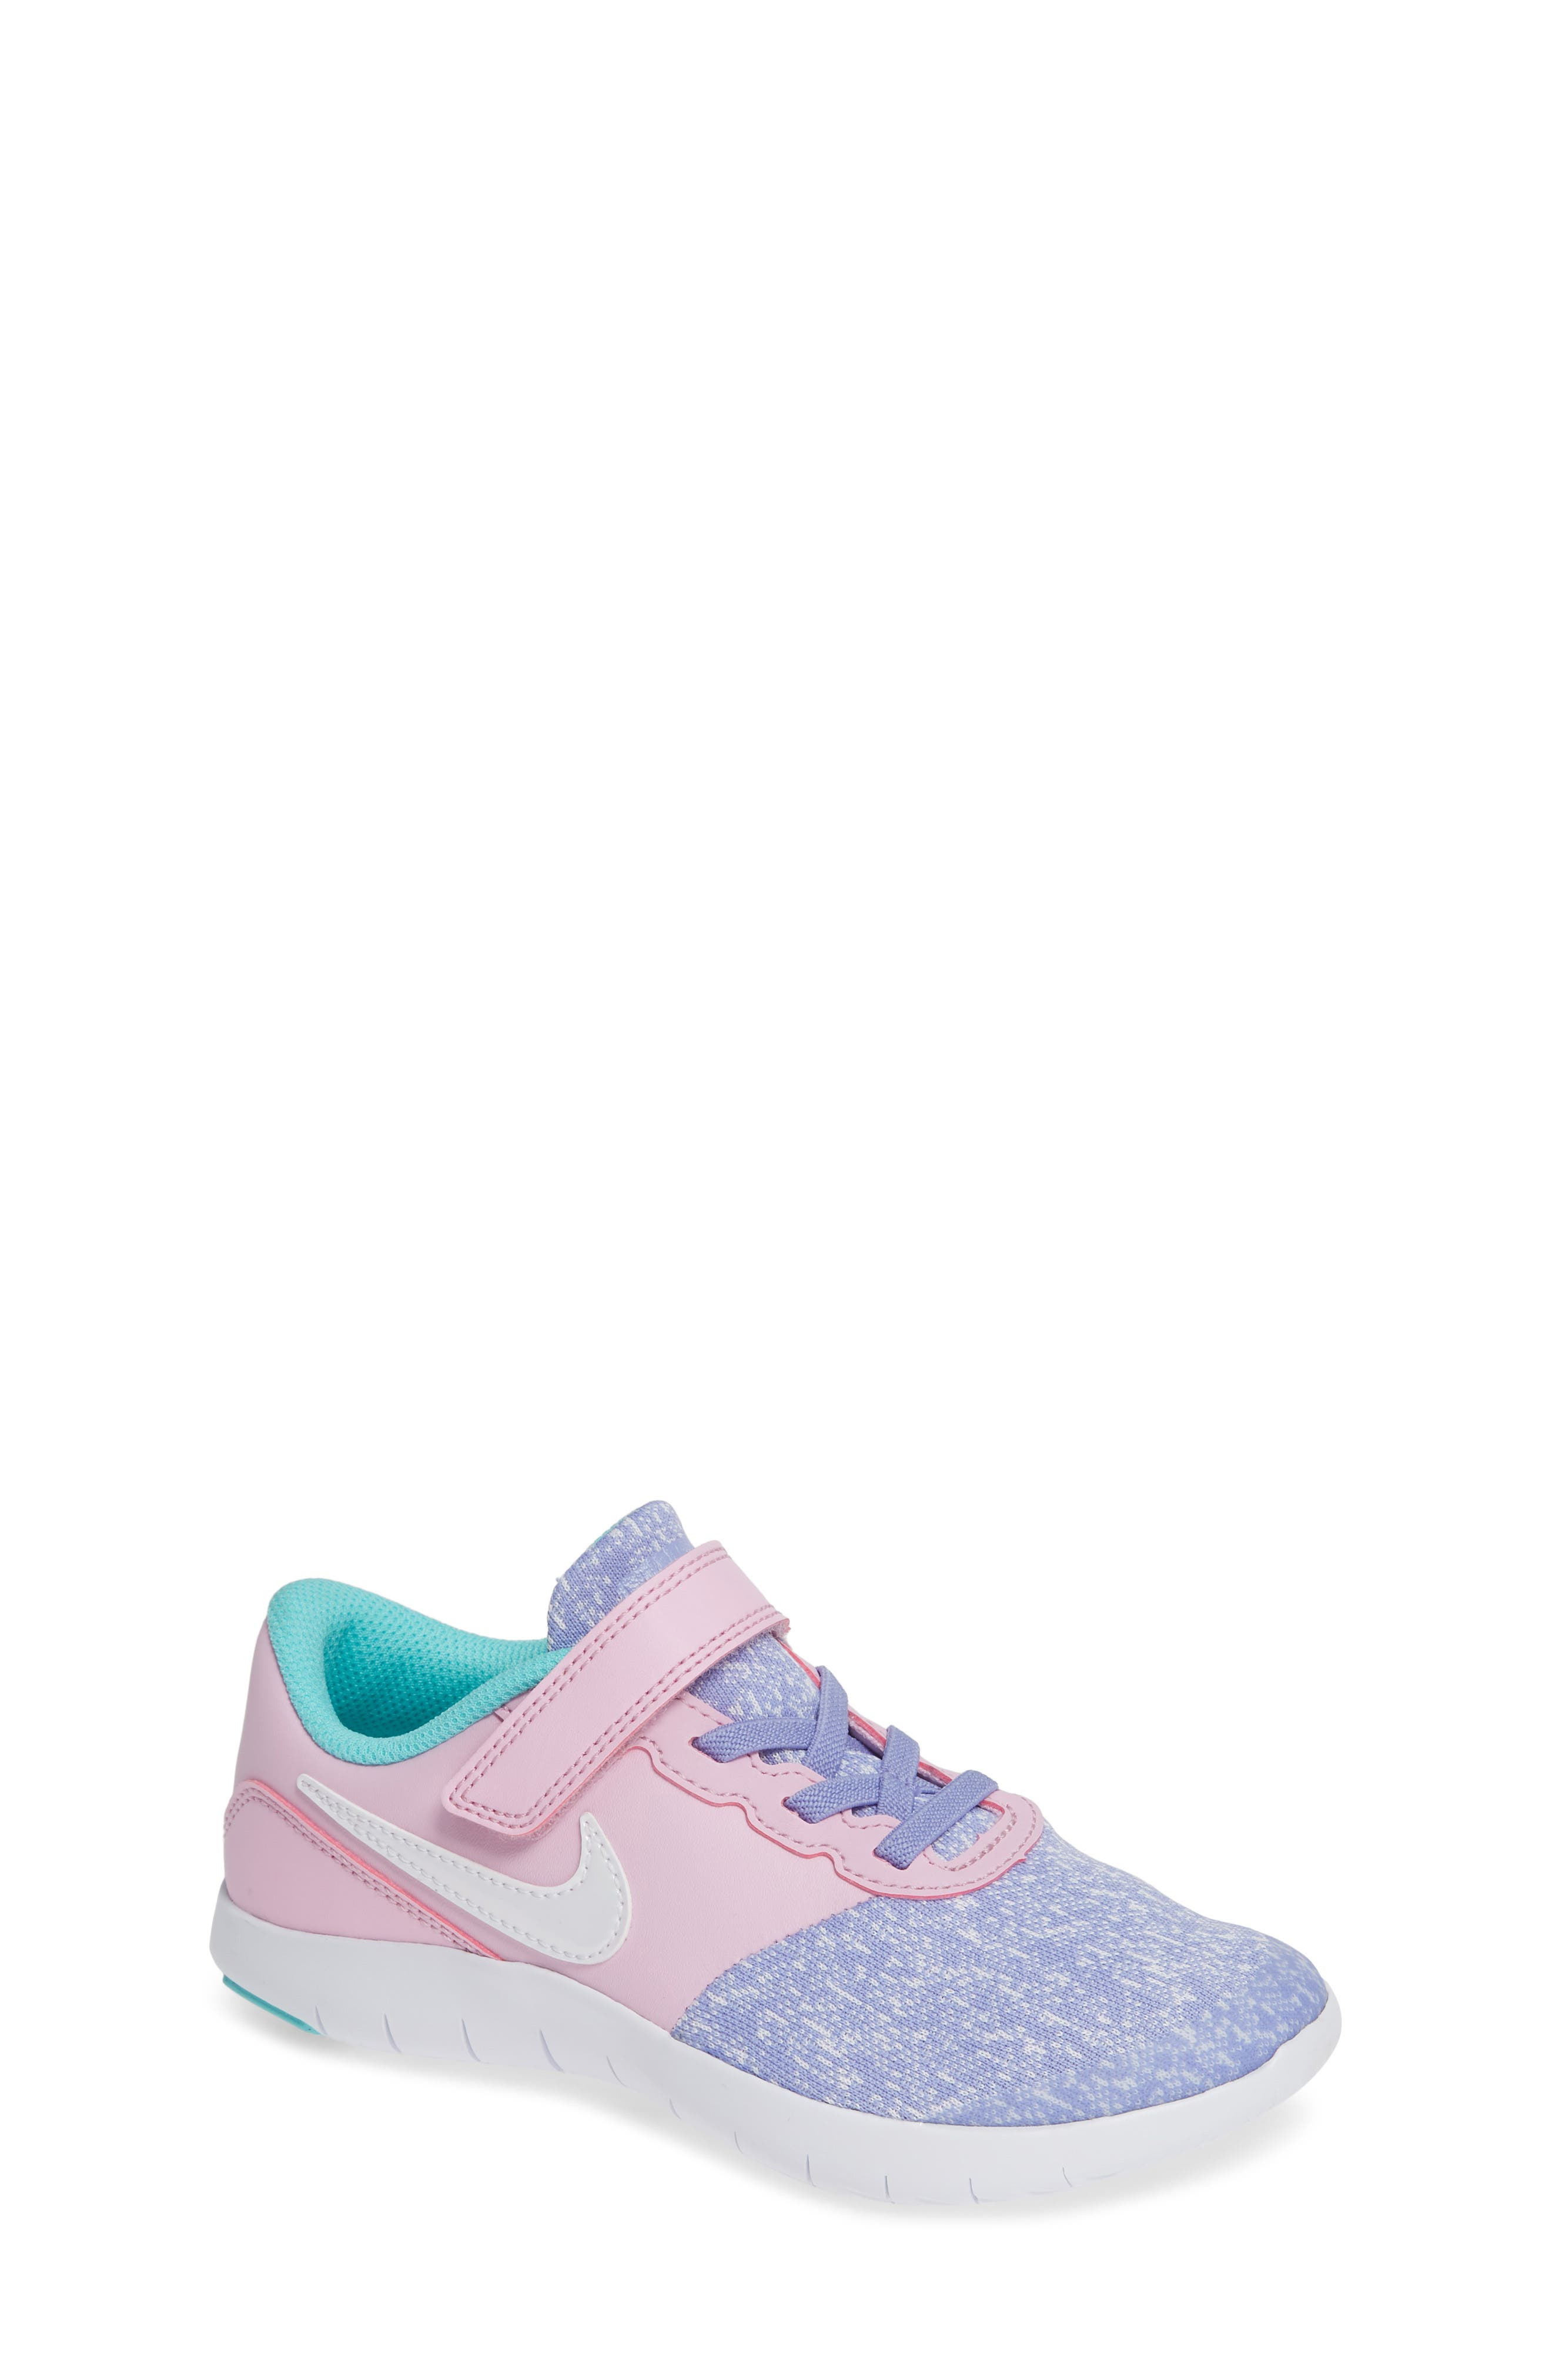 NIKE, Flex Contact Running Shoe, Main thumbnail 1, color, TWILIGHT PULSE WHITE AQUA